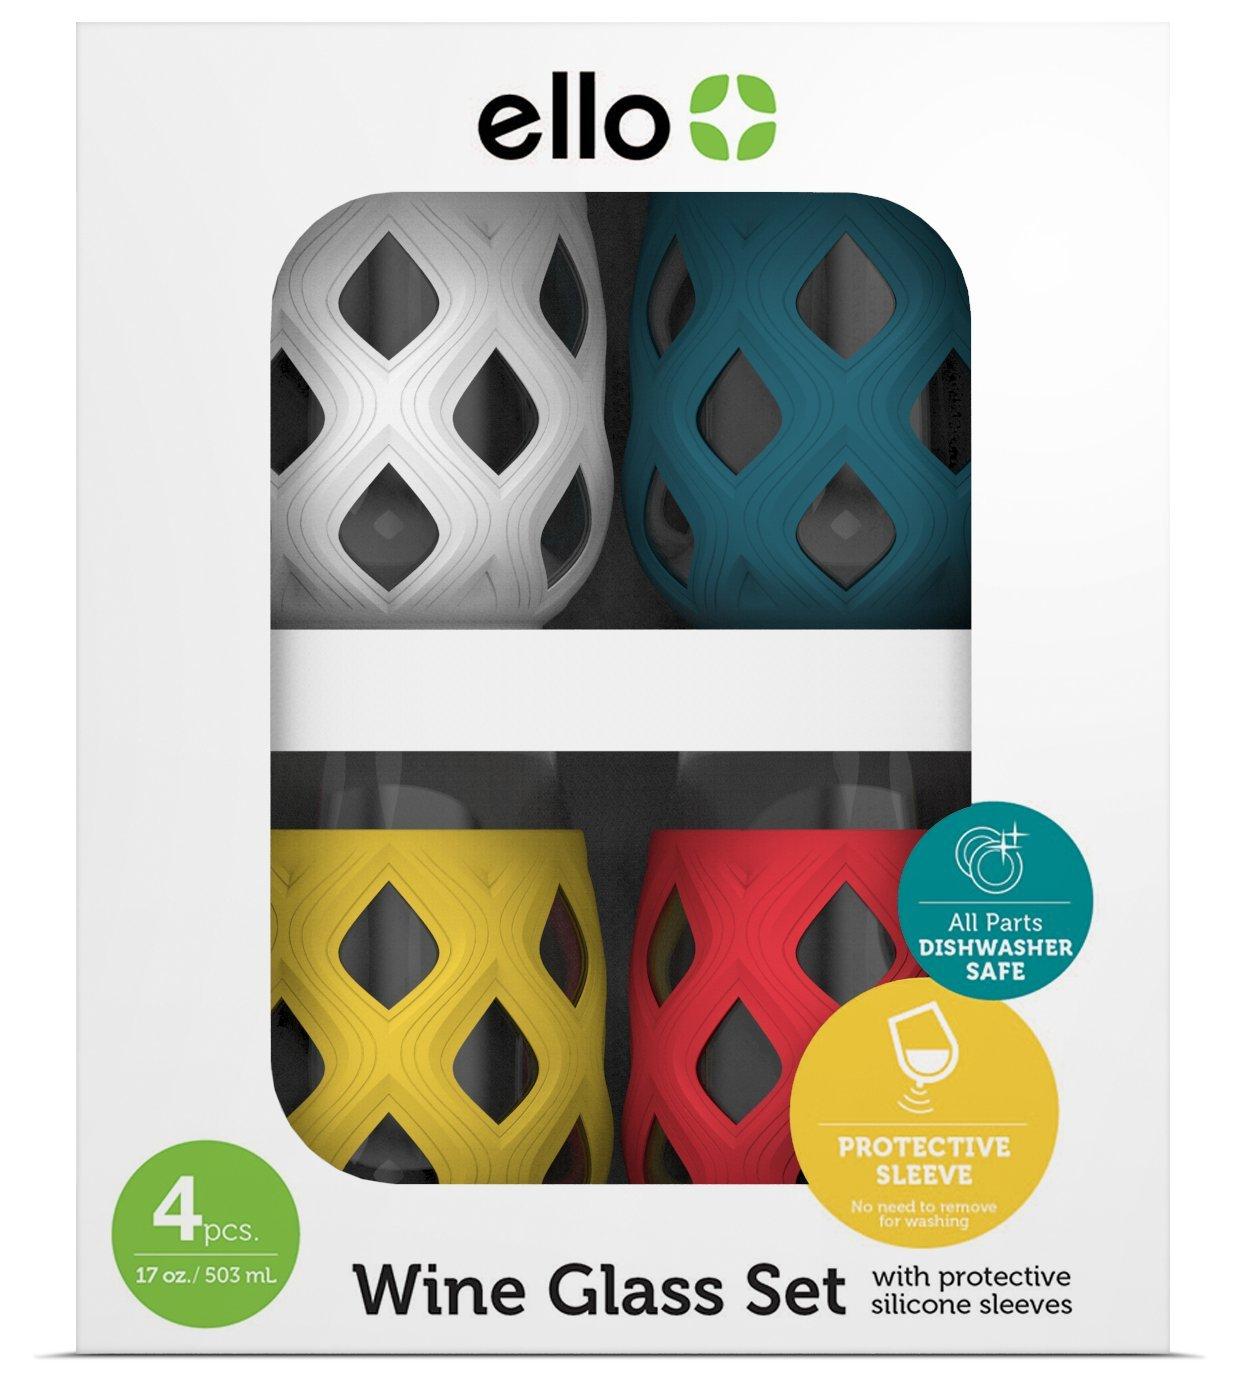 Ello Cru 17 Oz Stemless Wine Glass Set with Silicone Sleeves, Mai Tai (4-Pack)